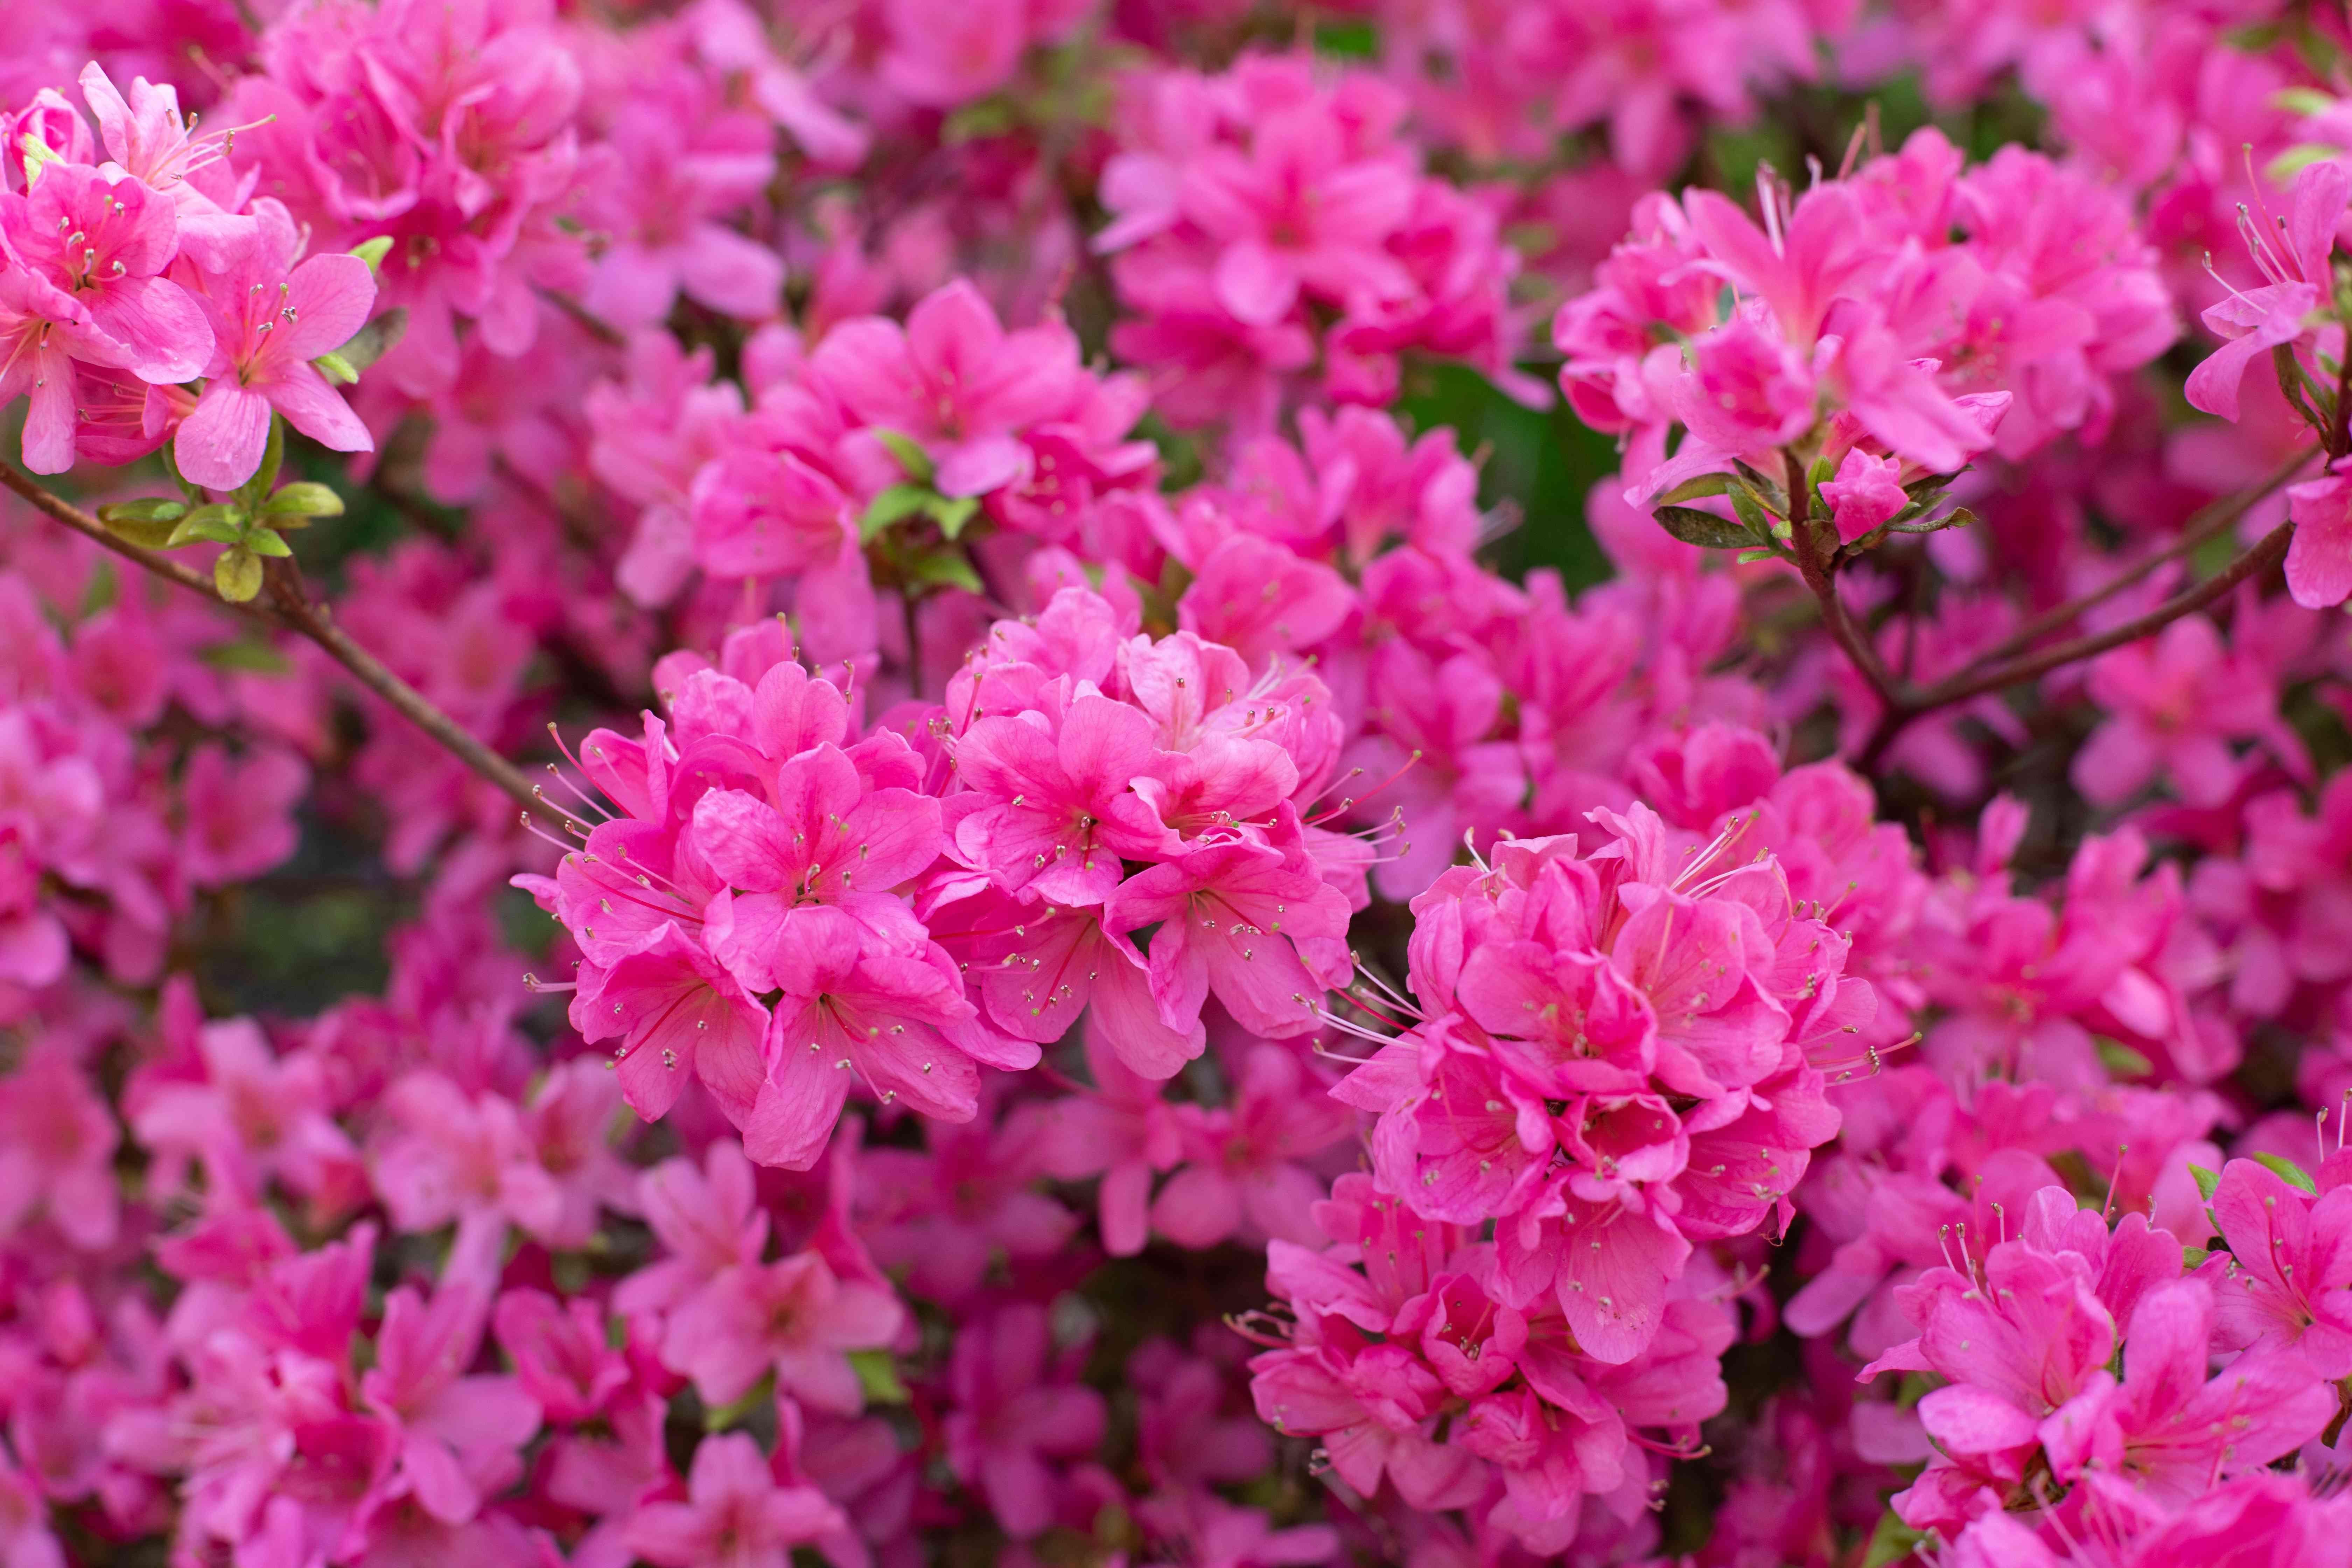 Azalea shrub with bright pink riffled flowers closeup